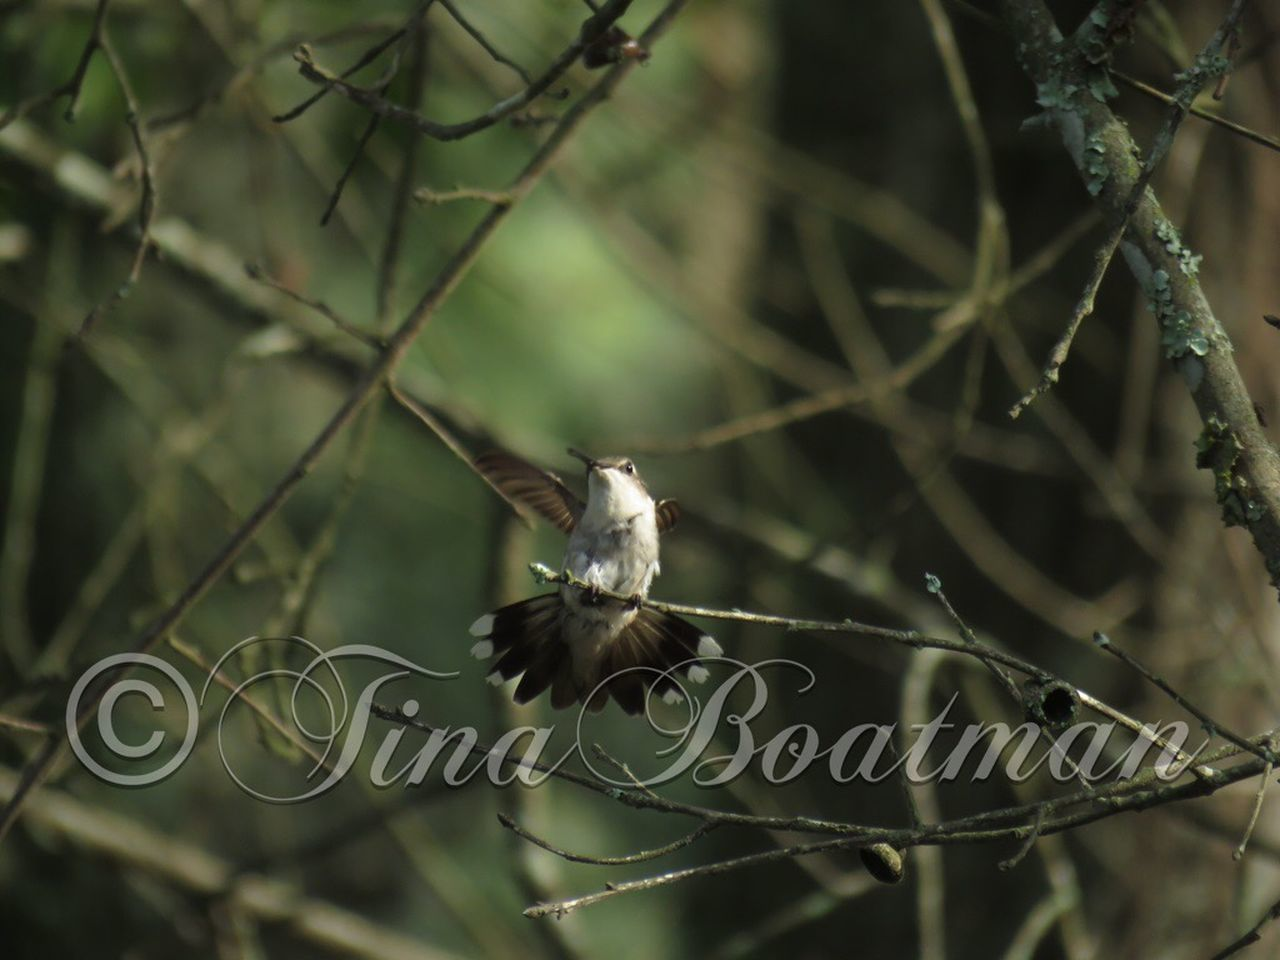 Female Rubythroatedhummingbird .. Hummingbird are so beautiful!